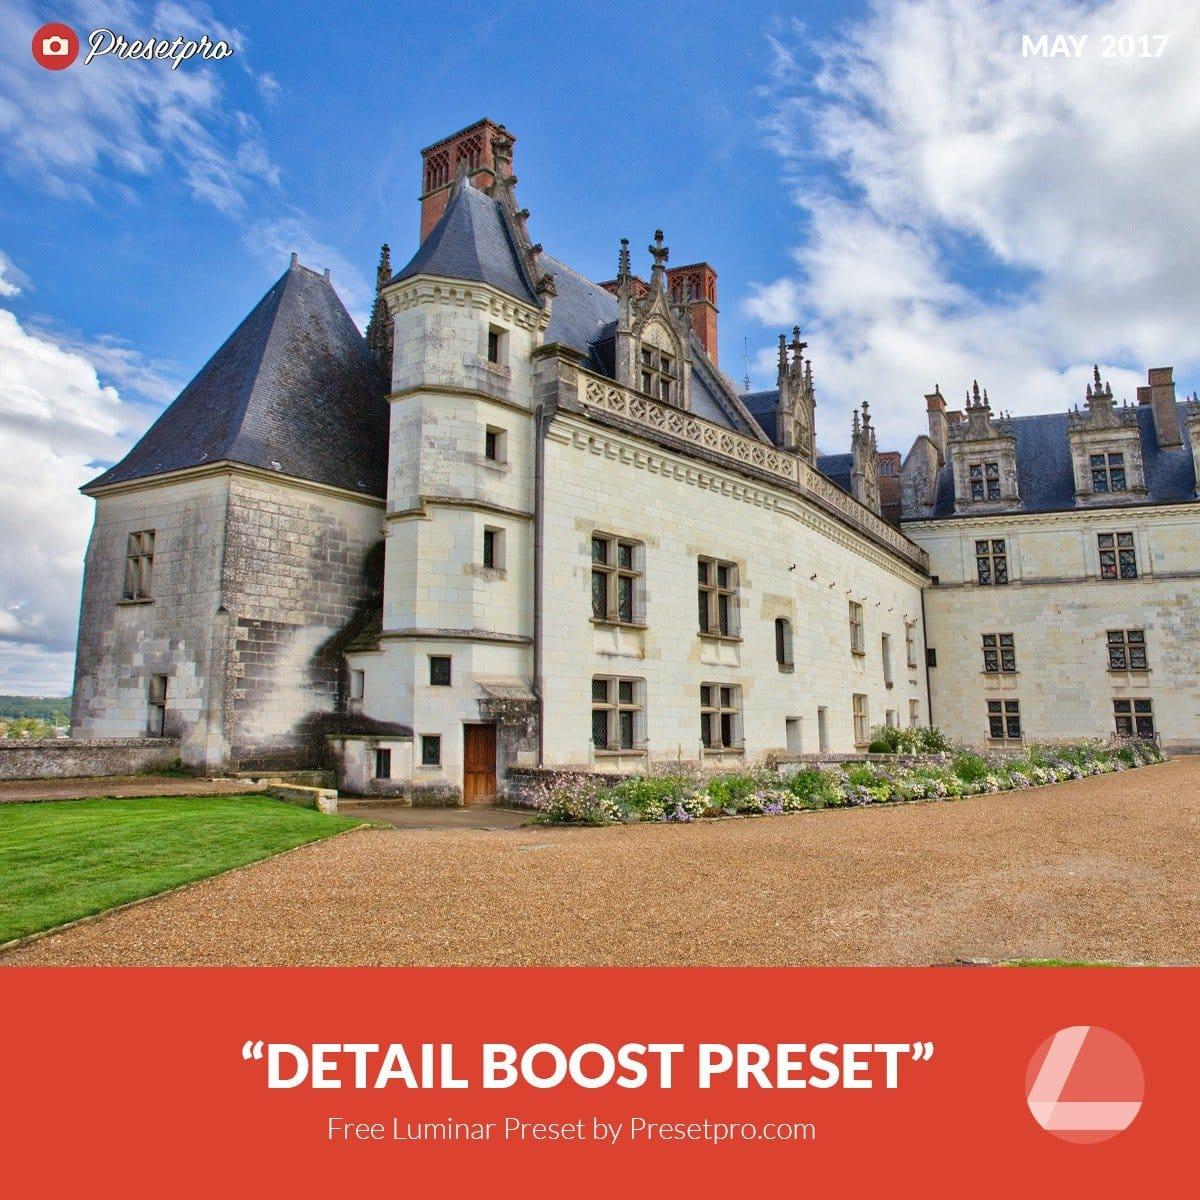 Free-Luminar-Preset-Detail-Boost-Presetpro.com